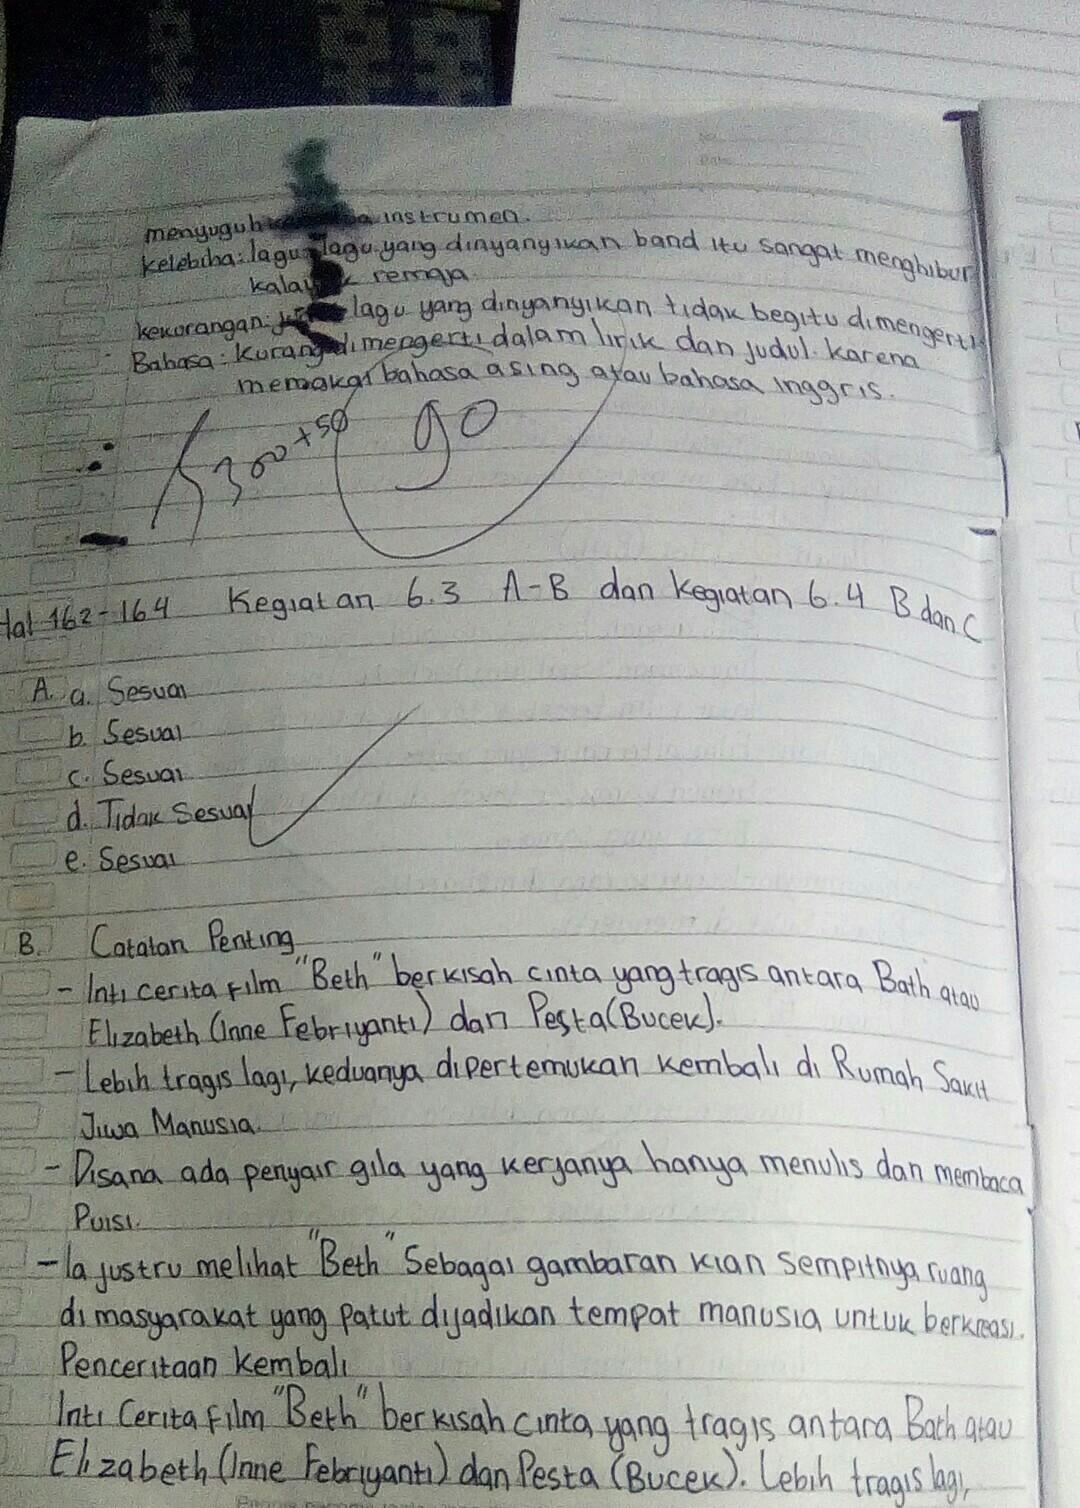 Kegiatan 5.5 Bahasa Indonesia Kelas 8 : kegiatan, bahasa, indonesia, kelas, Bahasa, Indonesia, Kelas, Kegiatan, Brainly.co.id